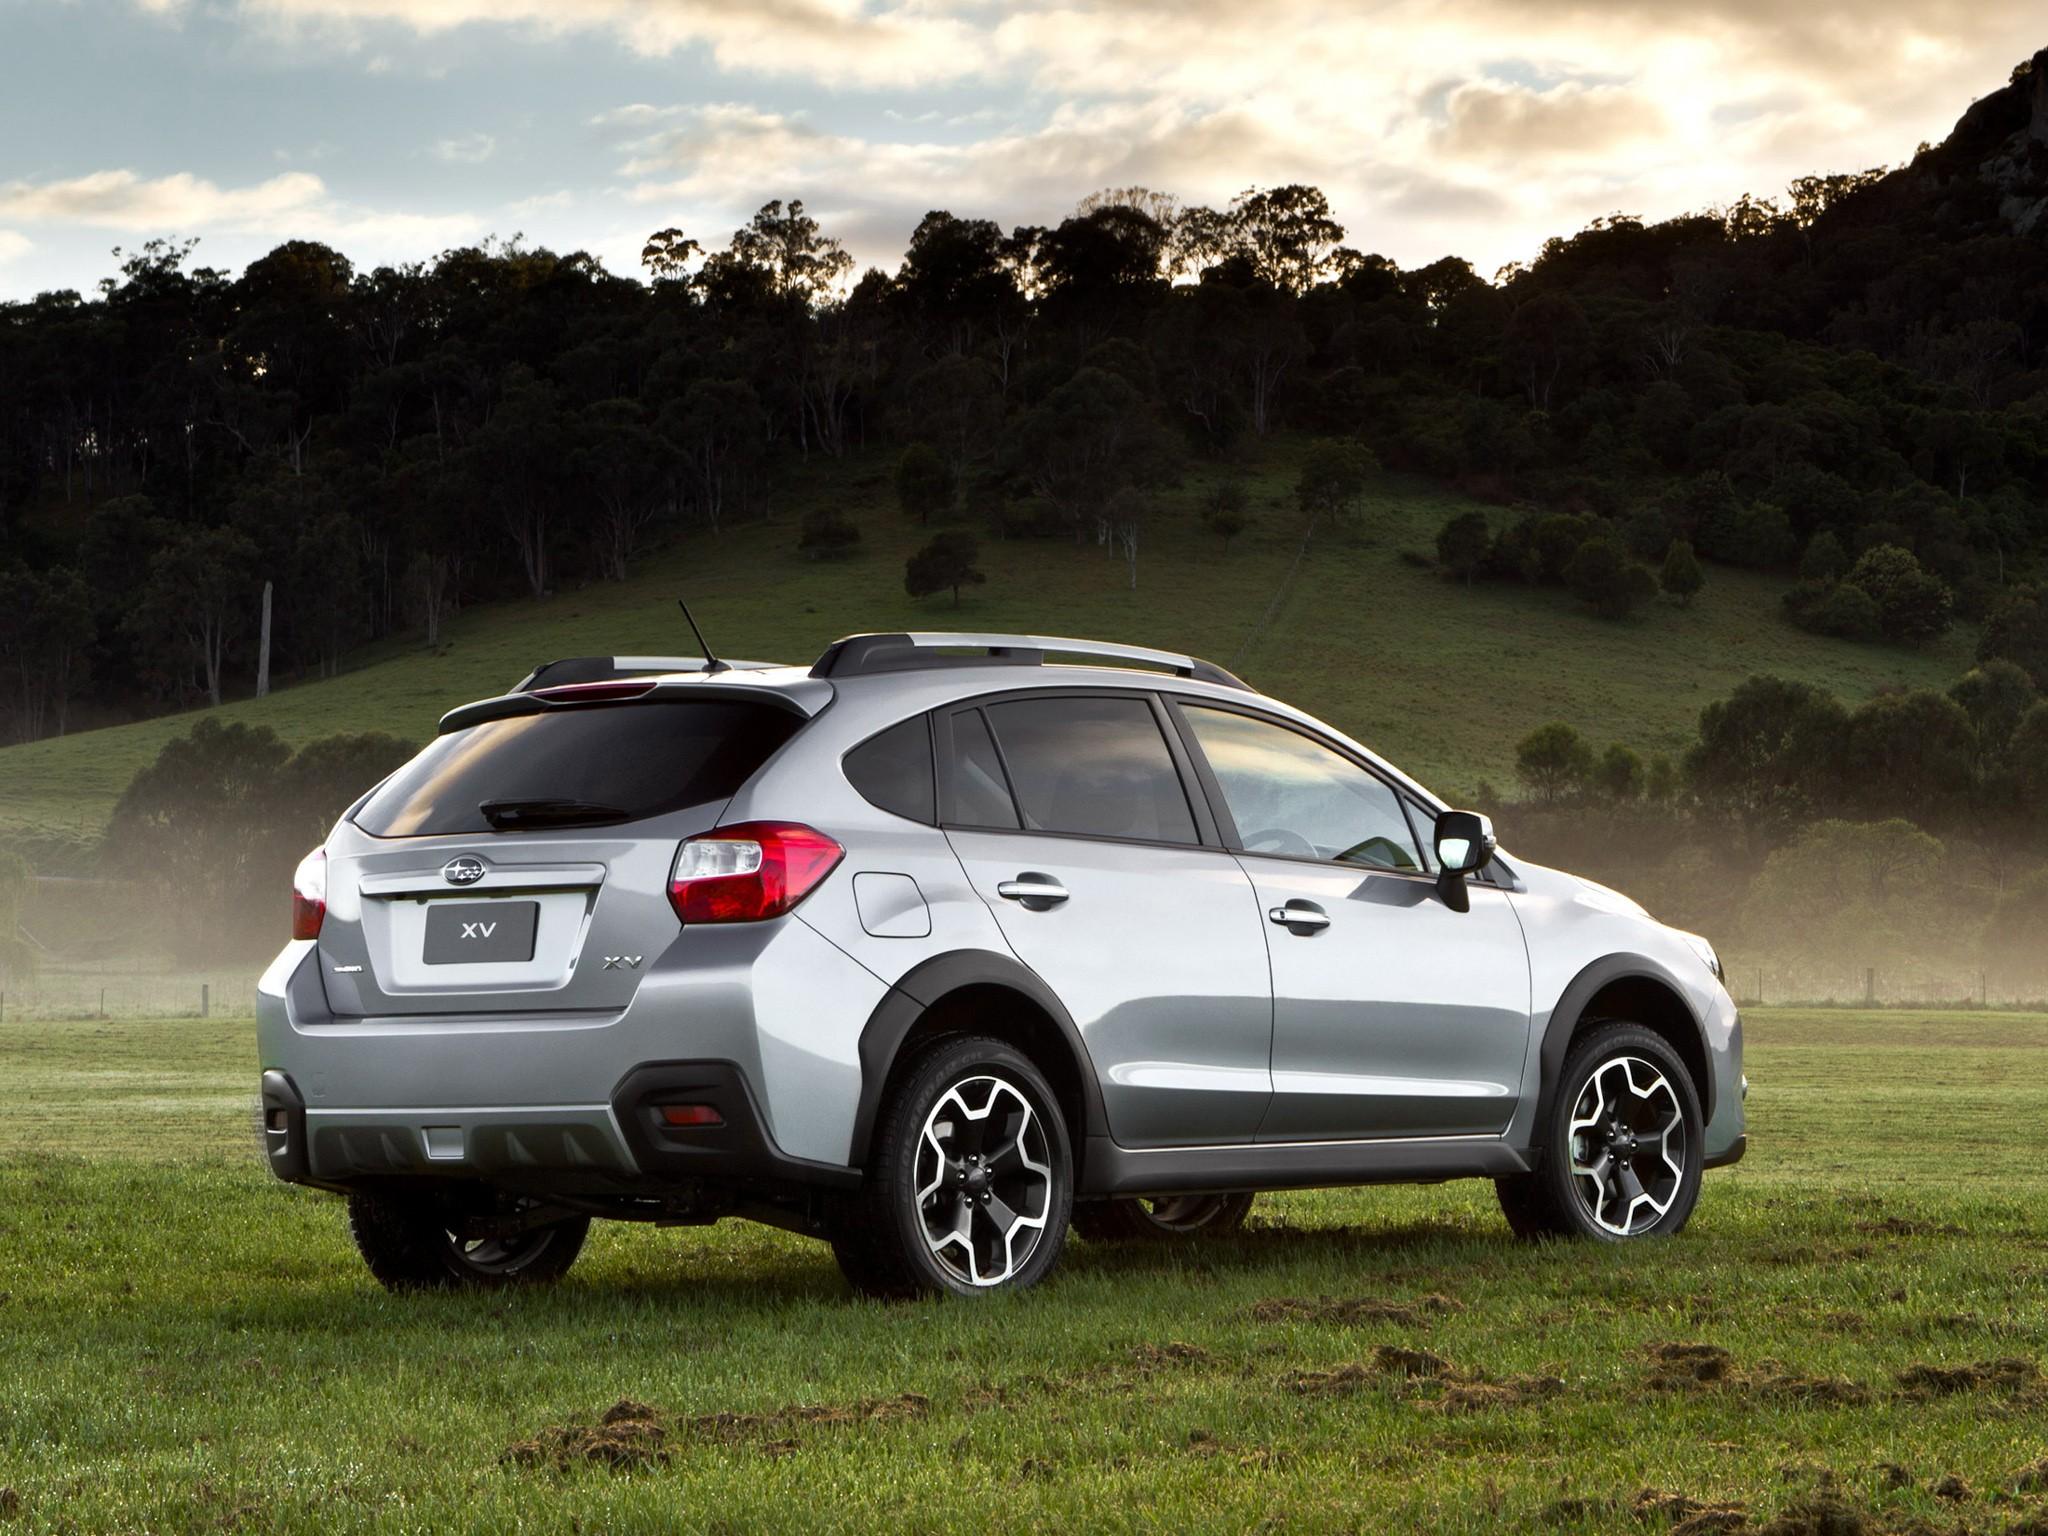 Subaru Xv Specs Amp Photos 2012 2013 2014 2015